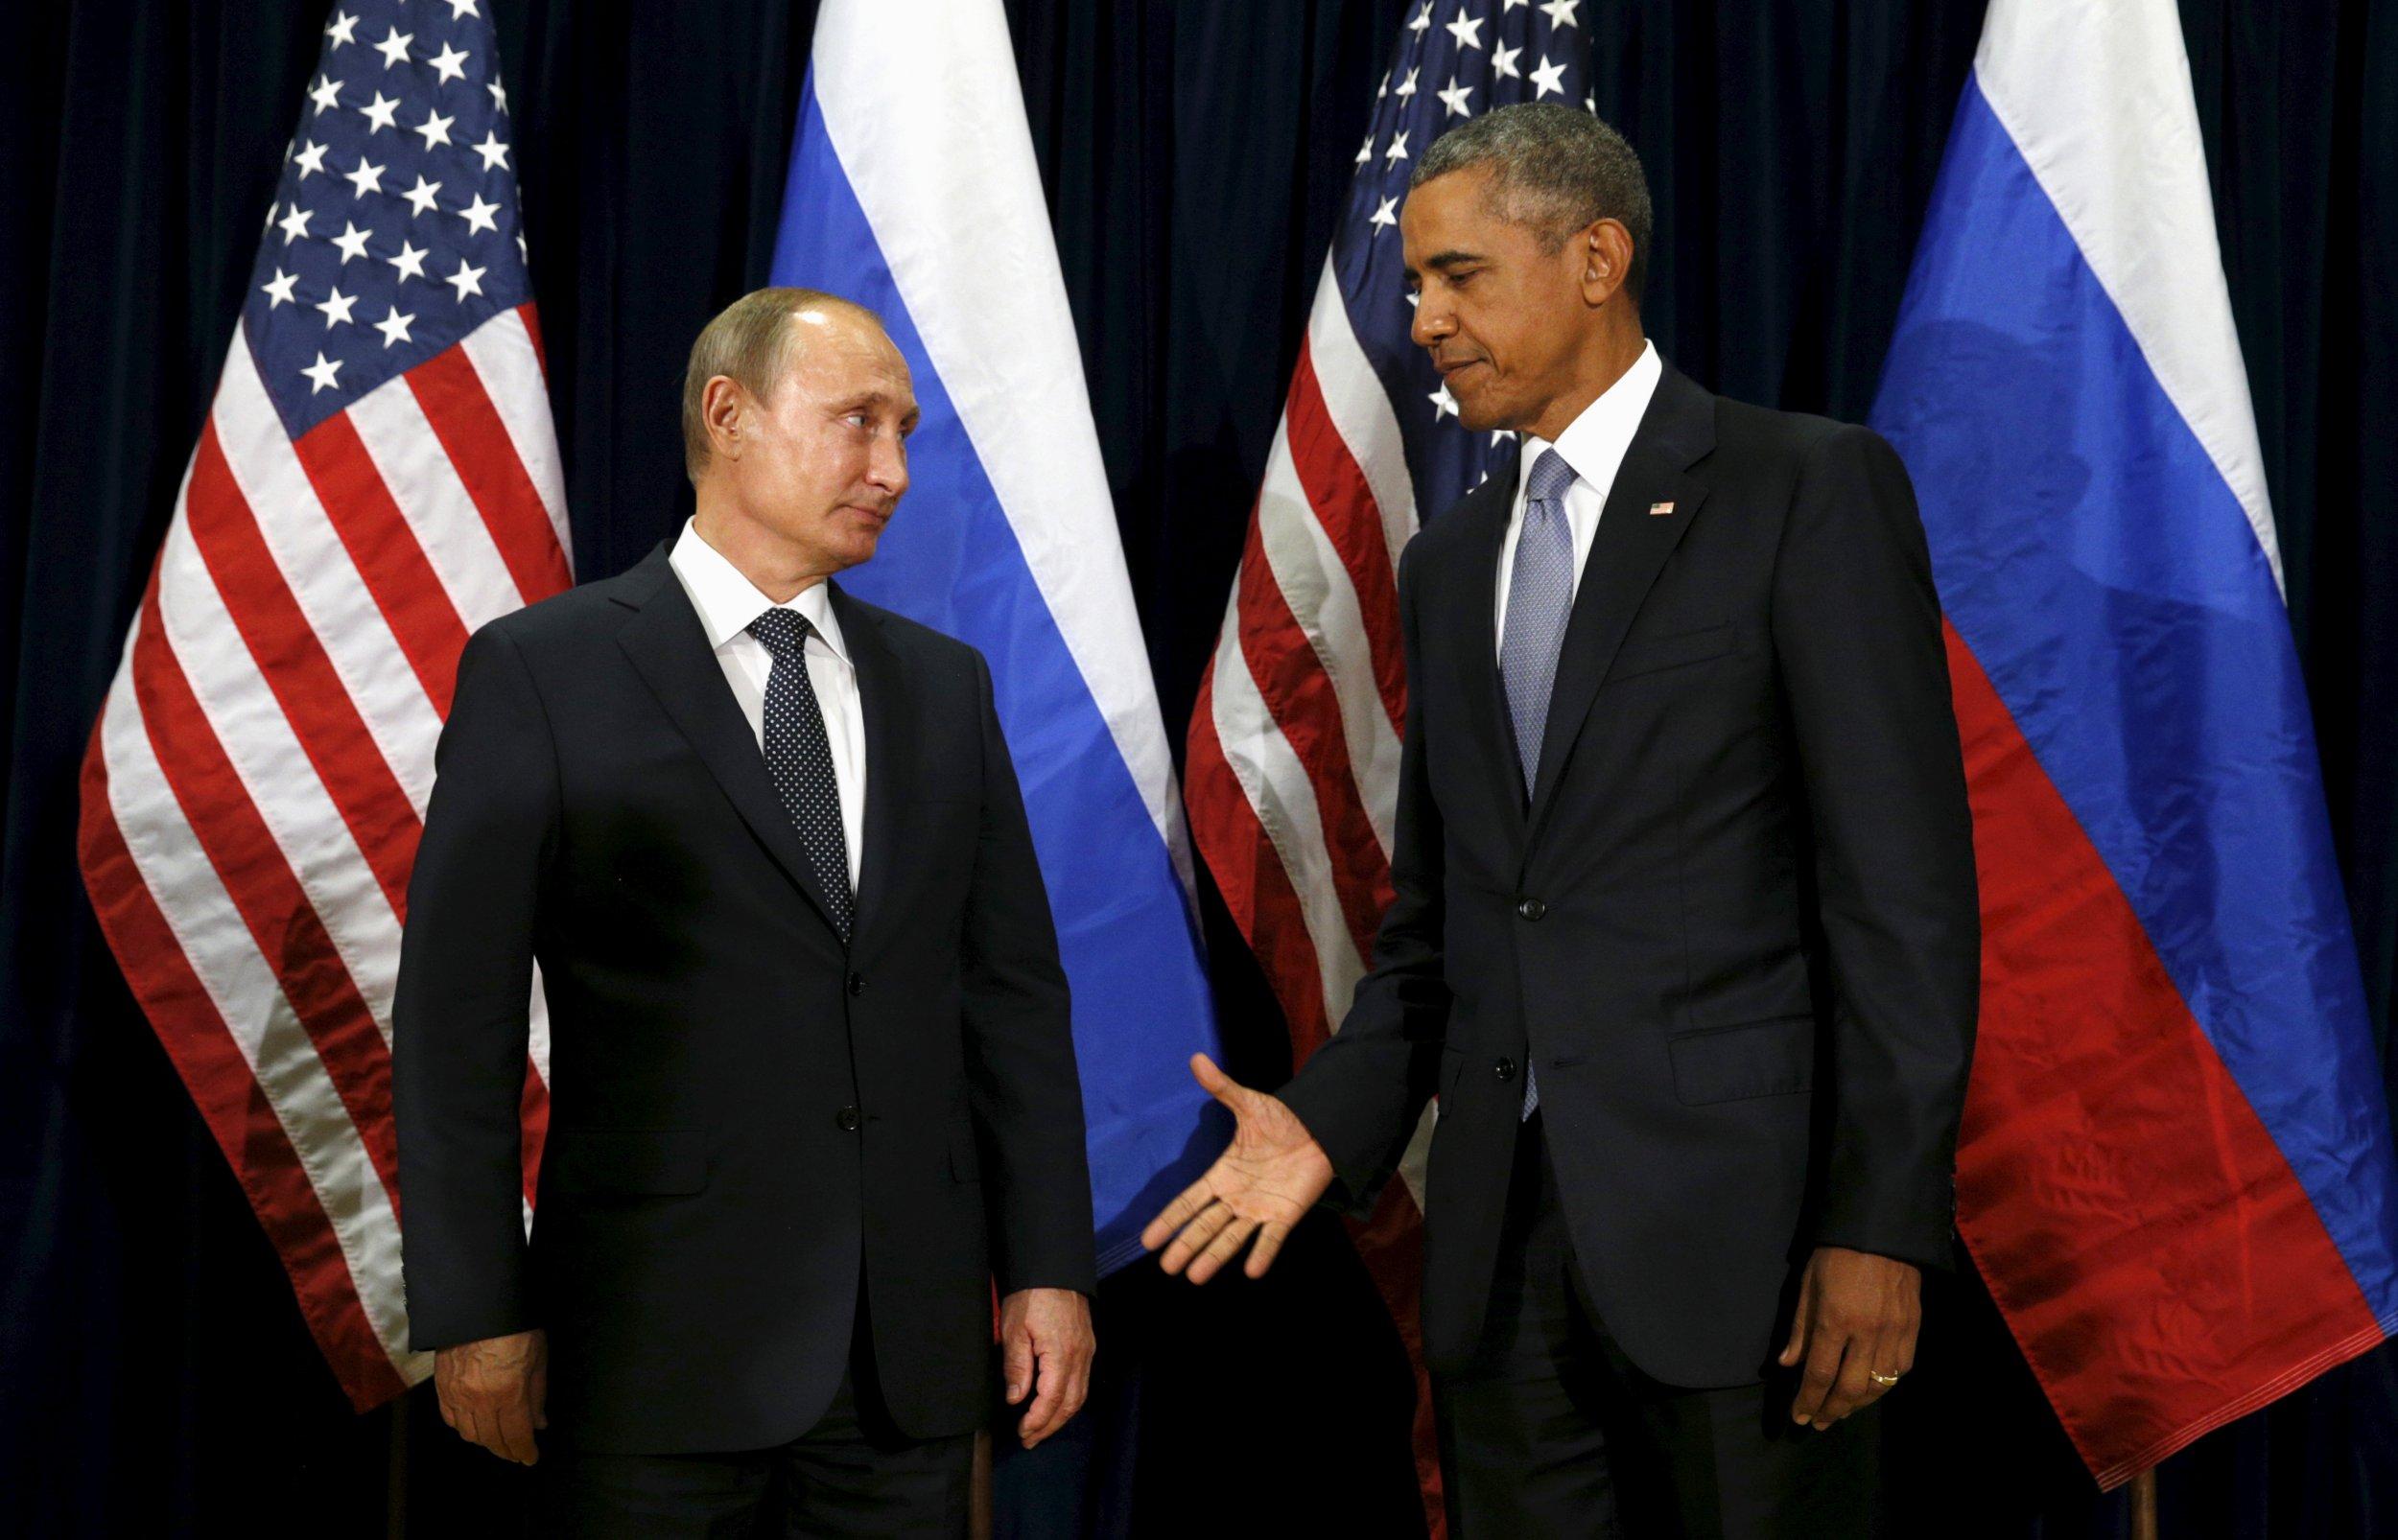 Putin Left